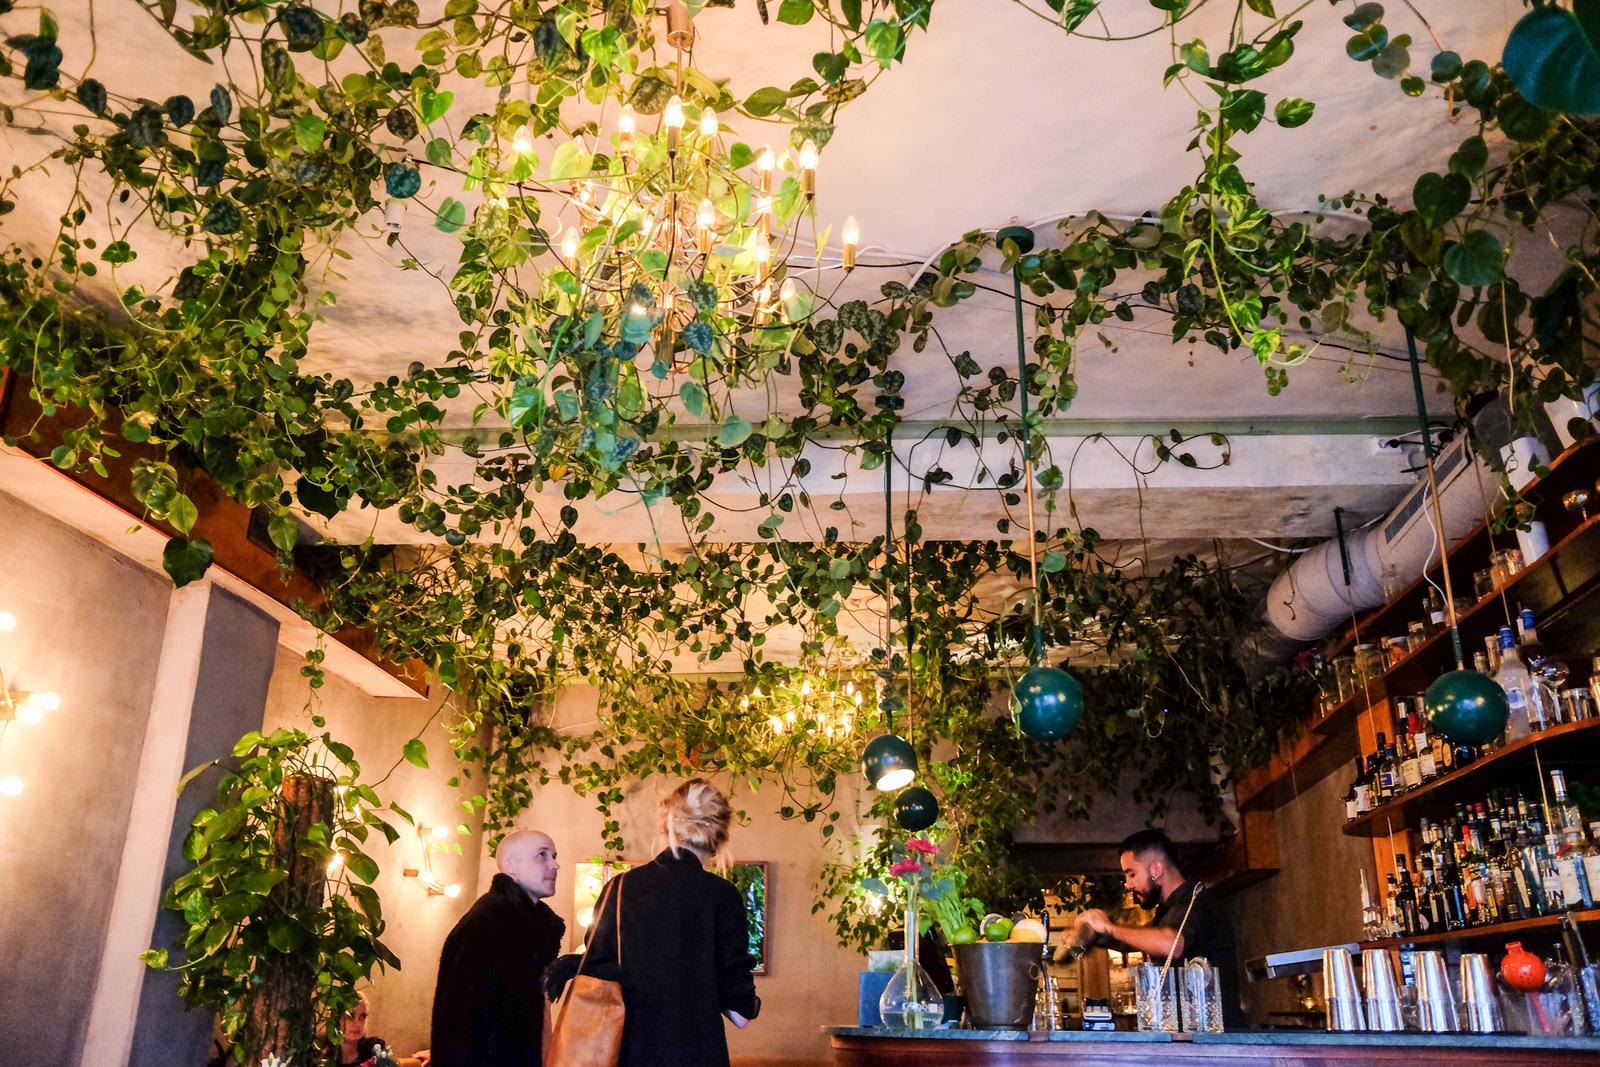 Torggata Botaniske @ Oslo, Norway